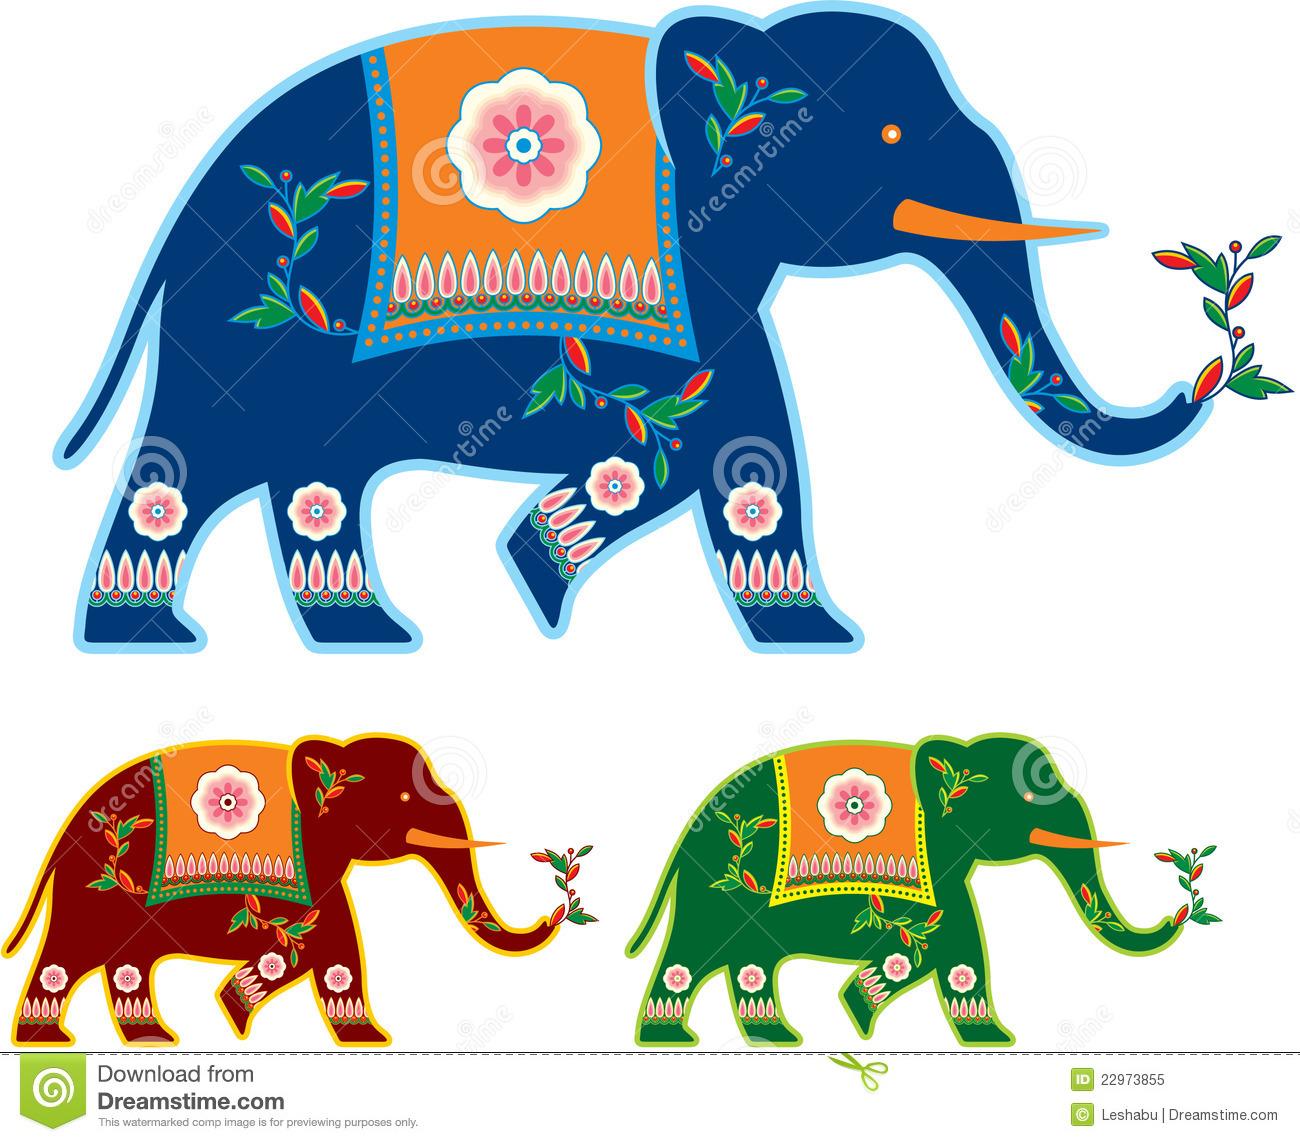 Asian Elephant clipart ornamental Royalty Image: Photo Image Indian